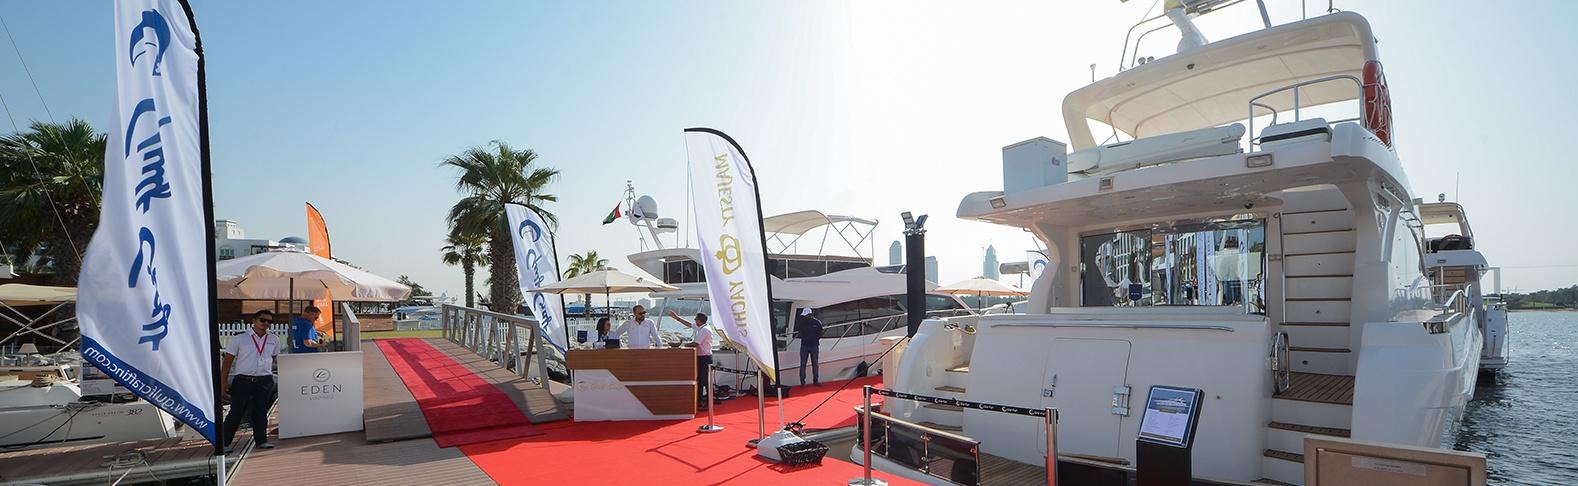 Dubai-pre-owned-boat-show-2018